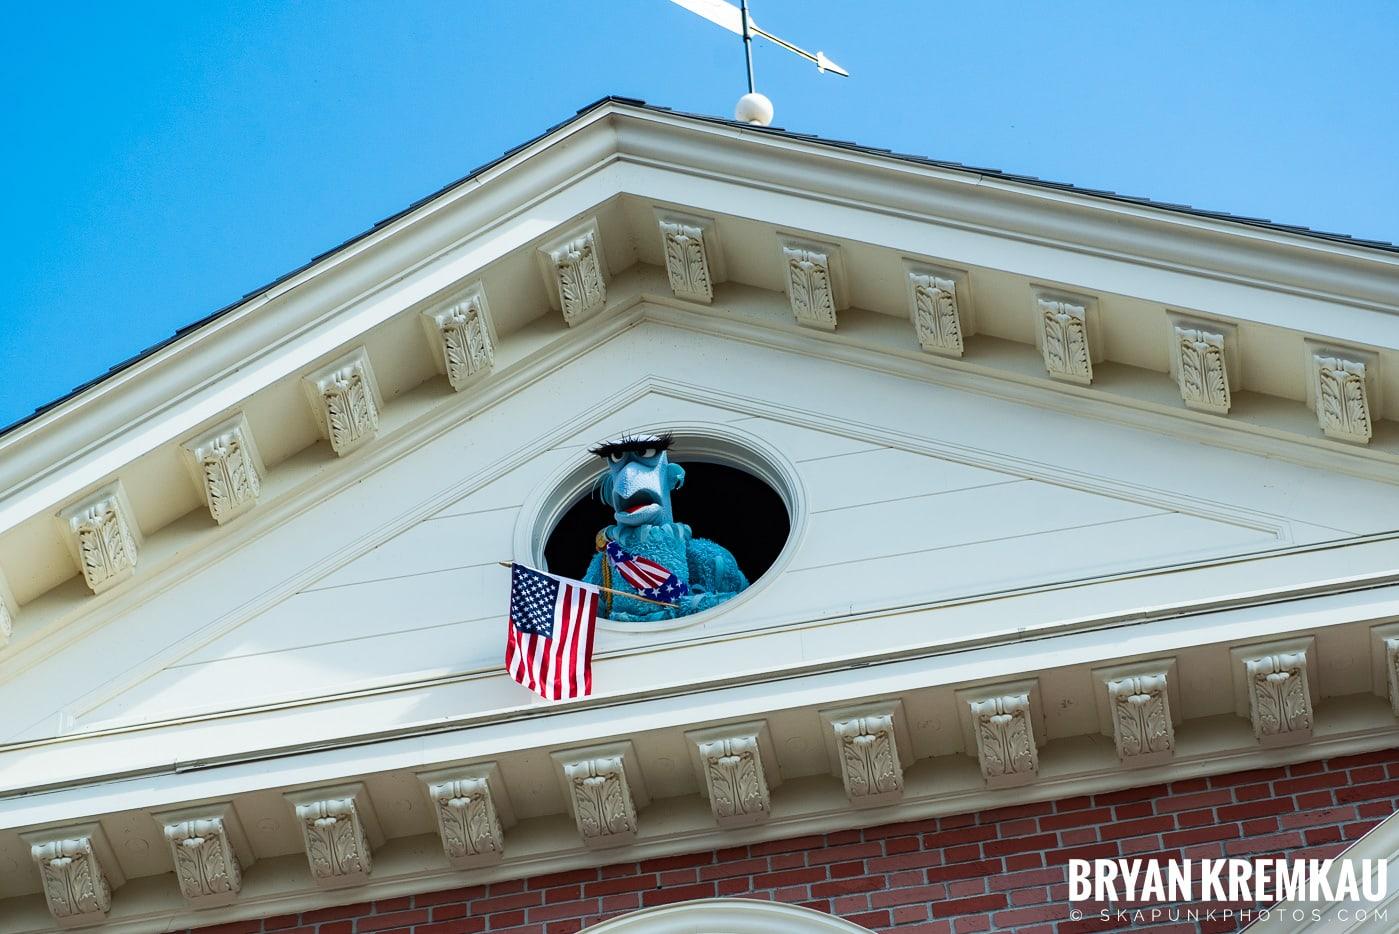 Walt Disney World Vacation: Days 1 & 2 (Disney Springs & Magic Kingdom, Epcot) September 29th - 30th 2019 (18)